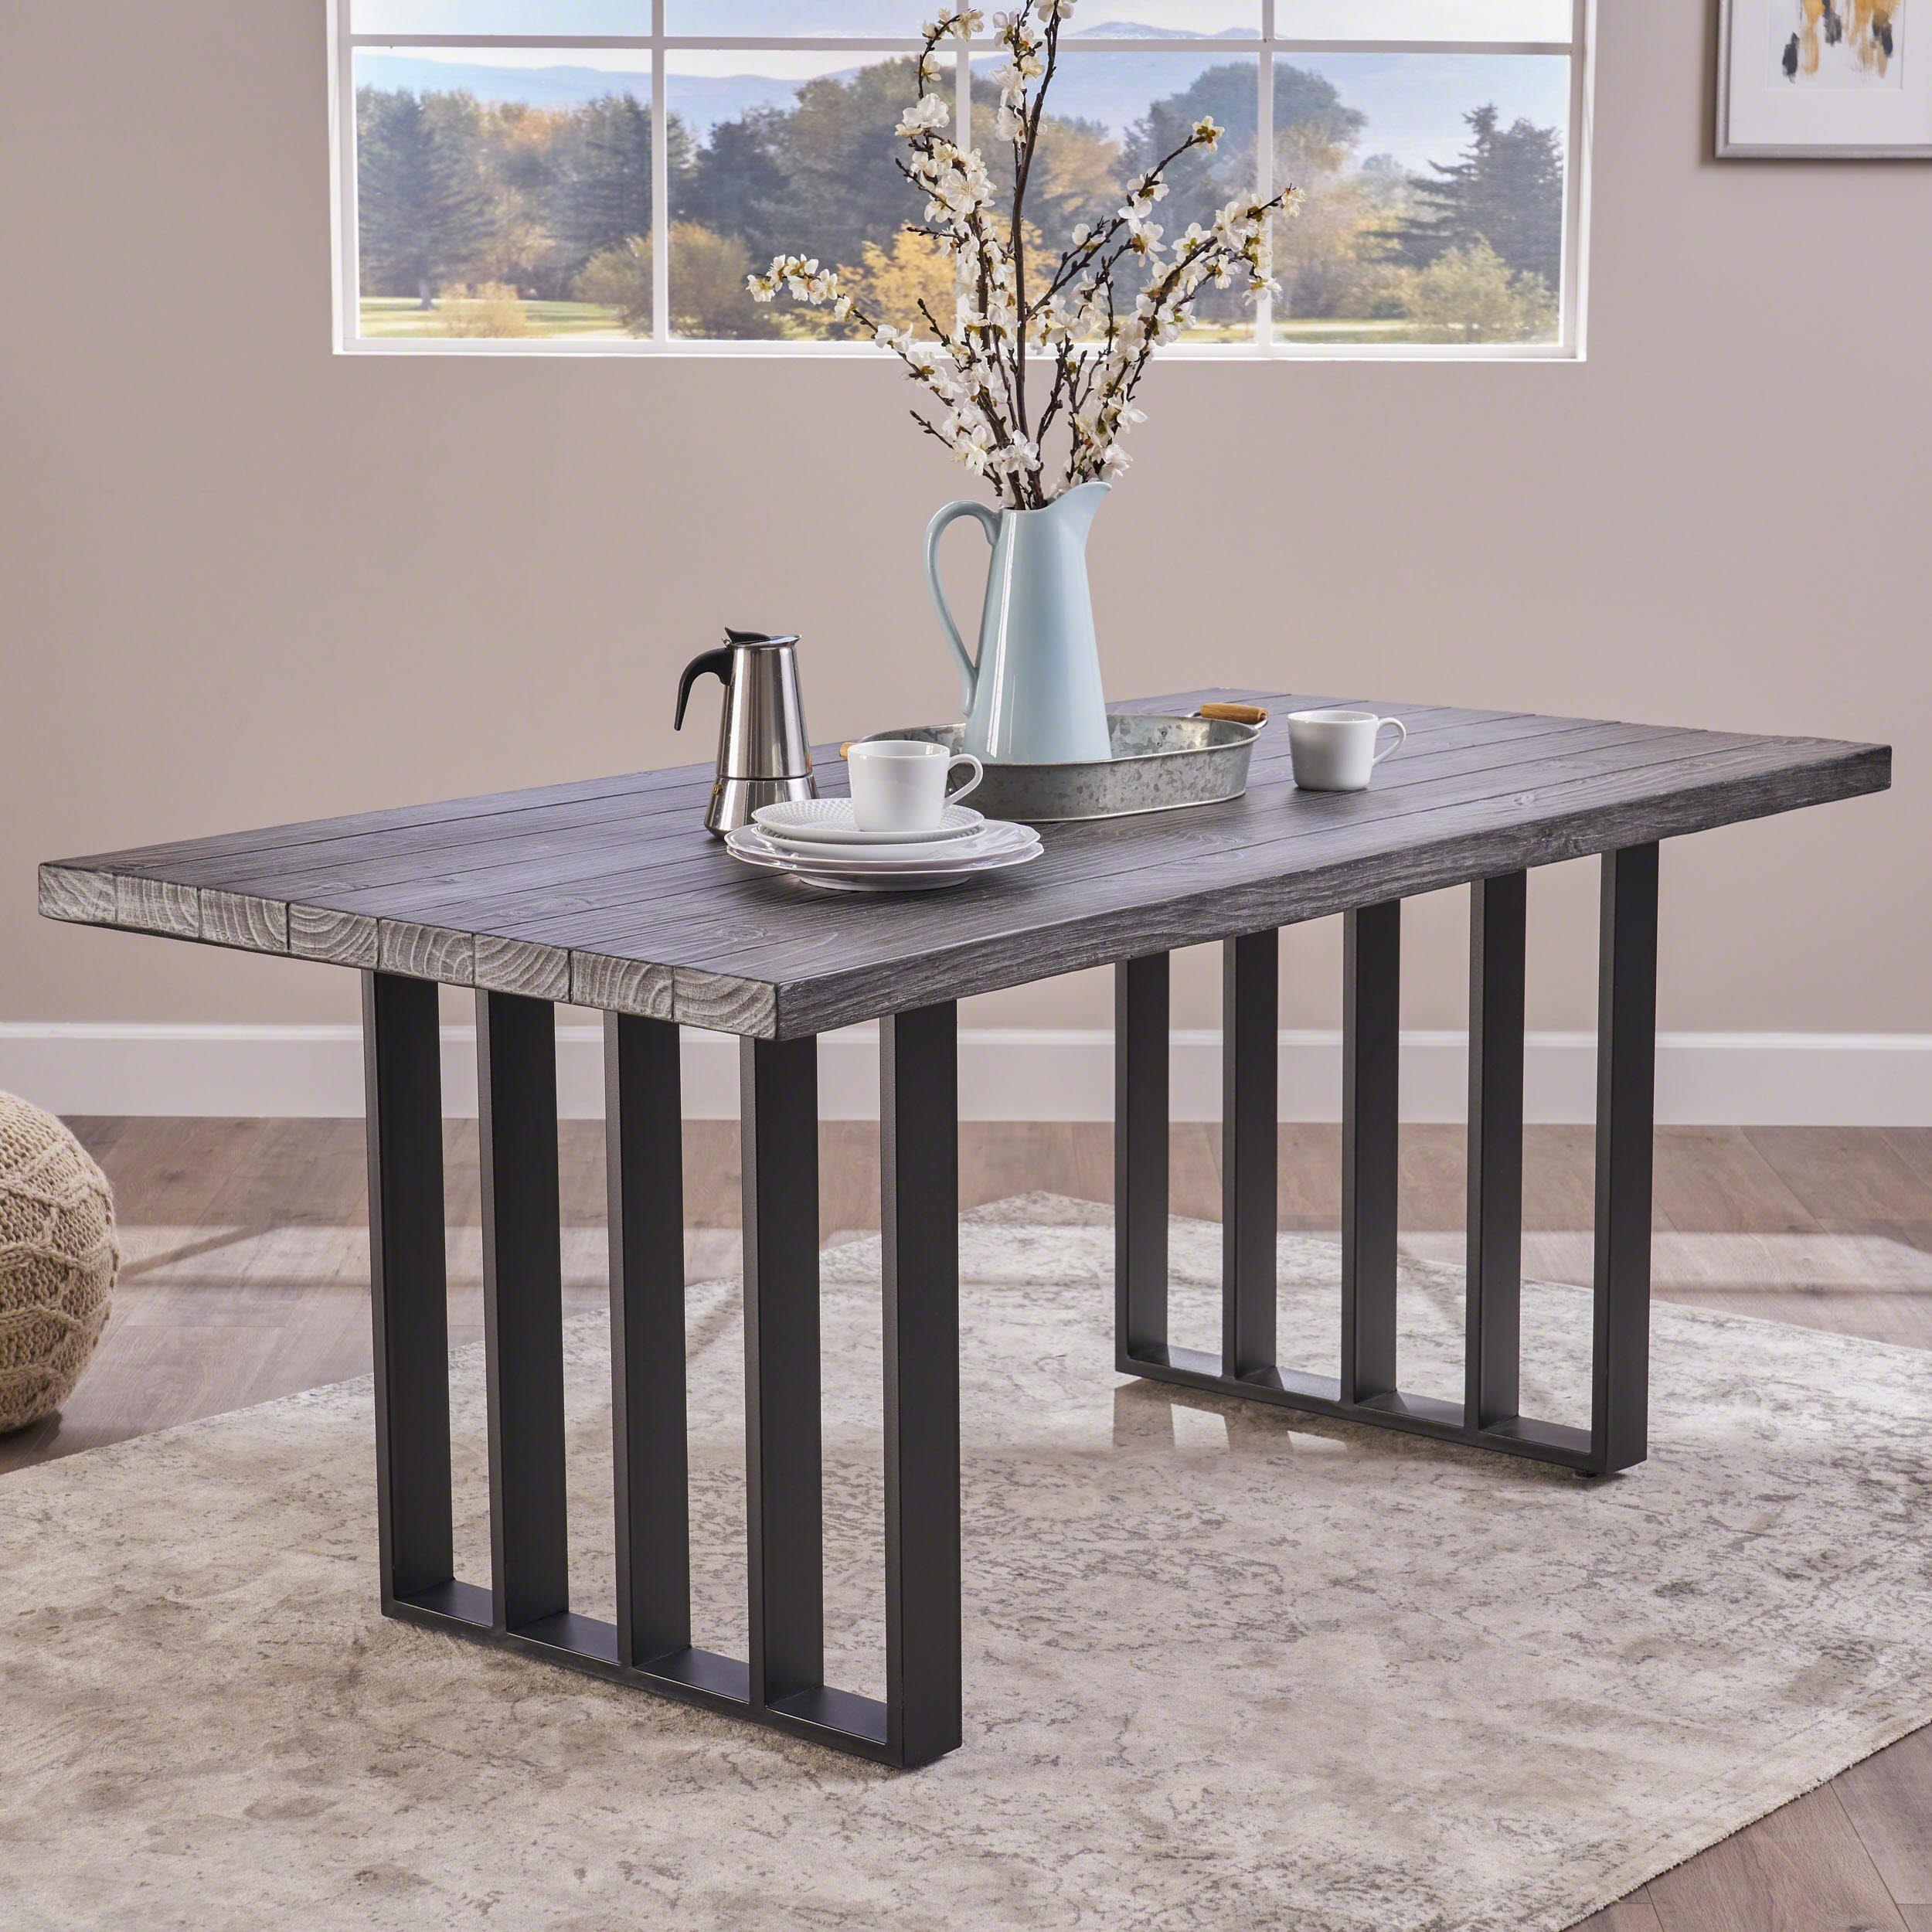 Jasmine indoor farmhouse grey oak finish light weight concrete dining table